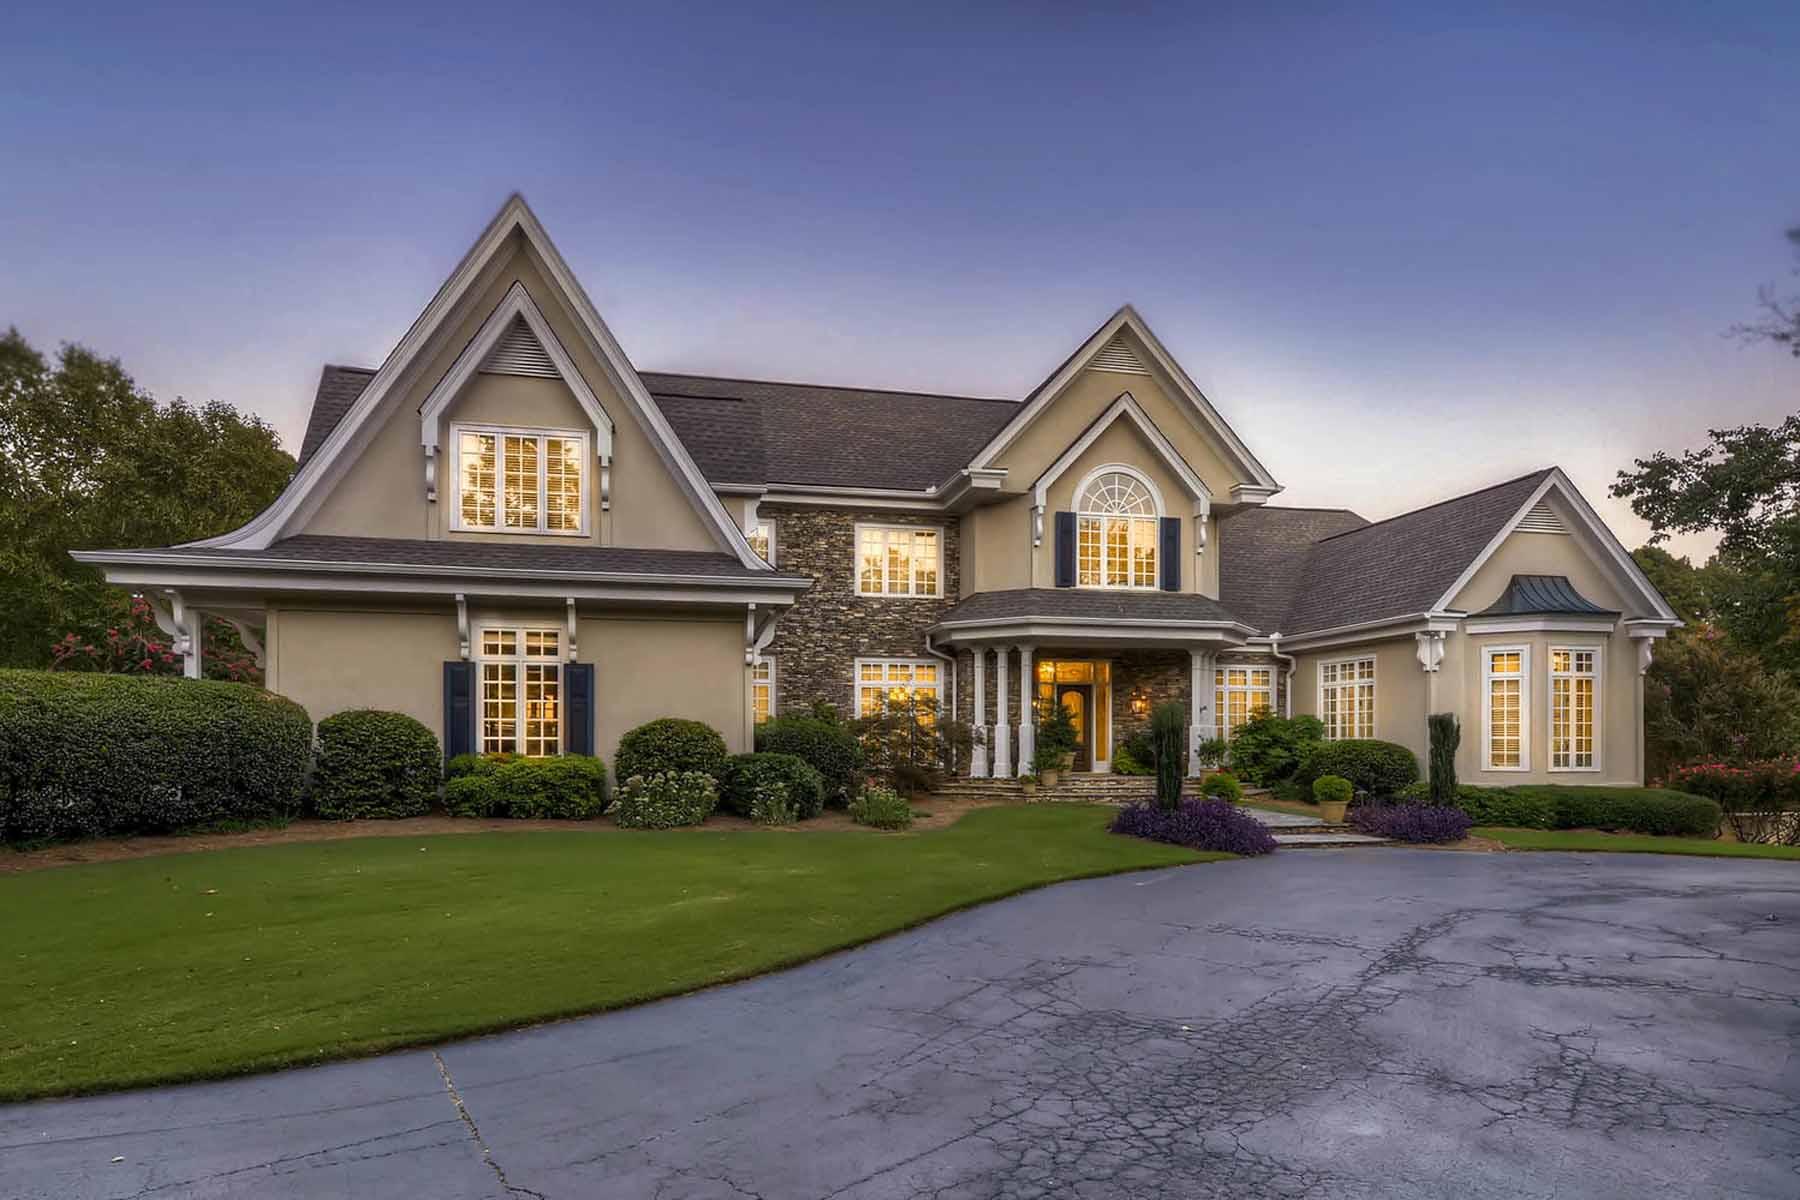 Casa Unifamiliar por un Venta en Elegant European Custom Home 10635 Nellie Brook Court Johns Creek, Georgia, 30097 Estados Unidos